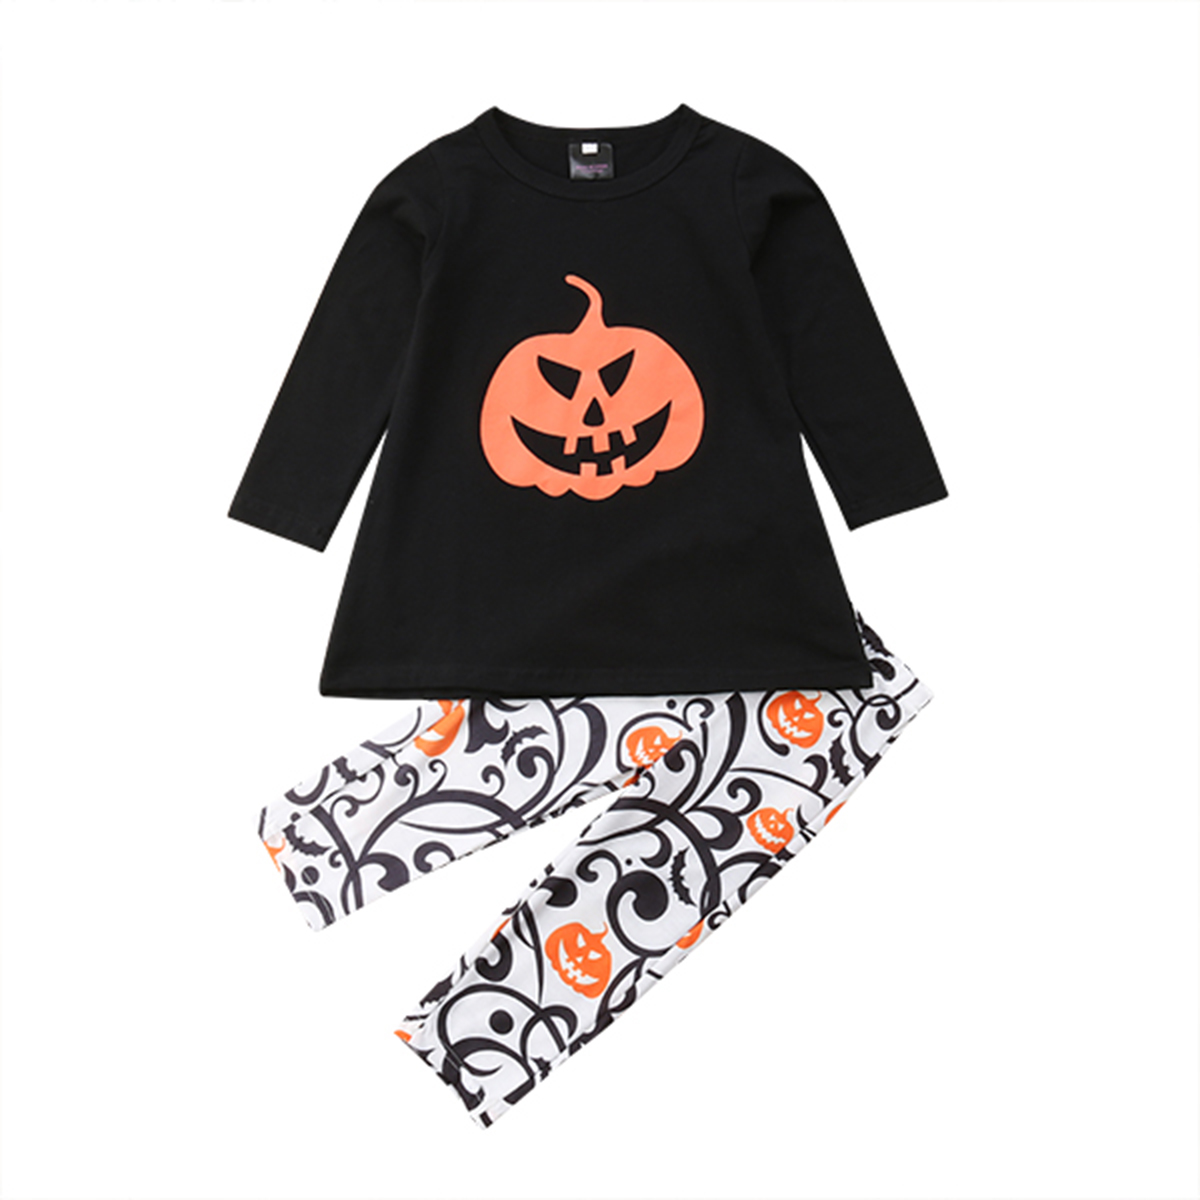 a32eaa77a245 Family Matching Long Sleeve Pumpkin Print T shirt Tops Pants Mom Kid ...